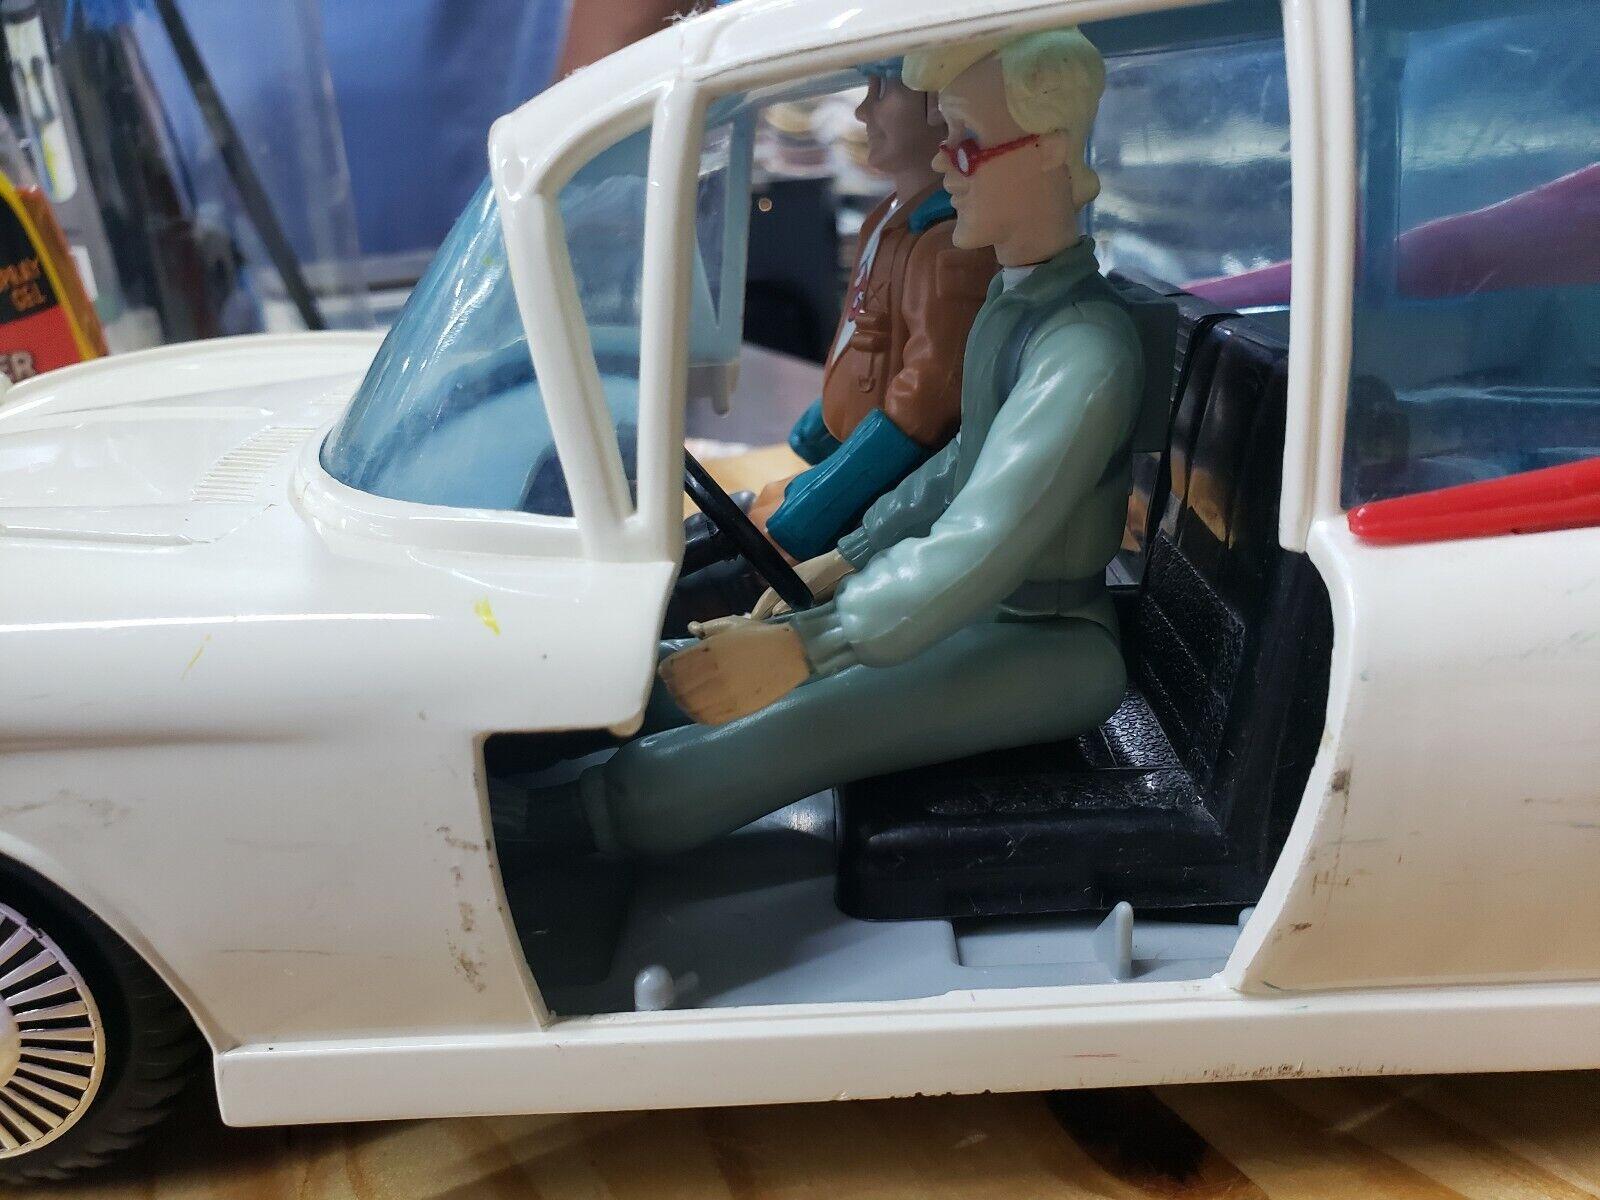 1984 Ghostbusters Ecto1 Ambulance Ambulance Ambulance Vehicle Vintage  with 4 Figures 8b2c86